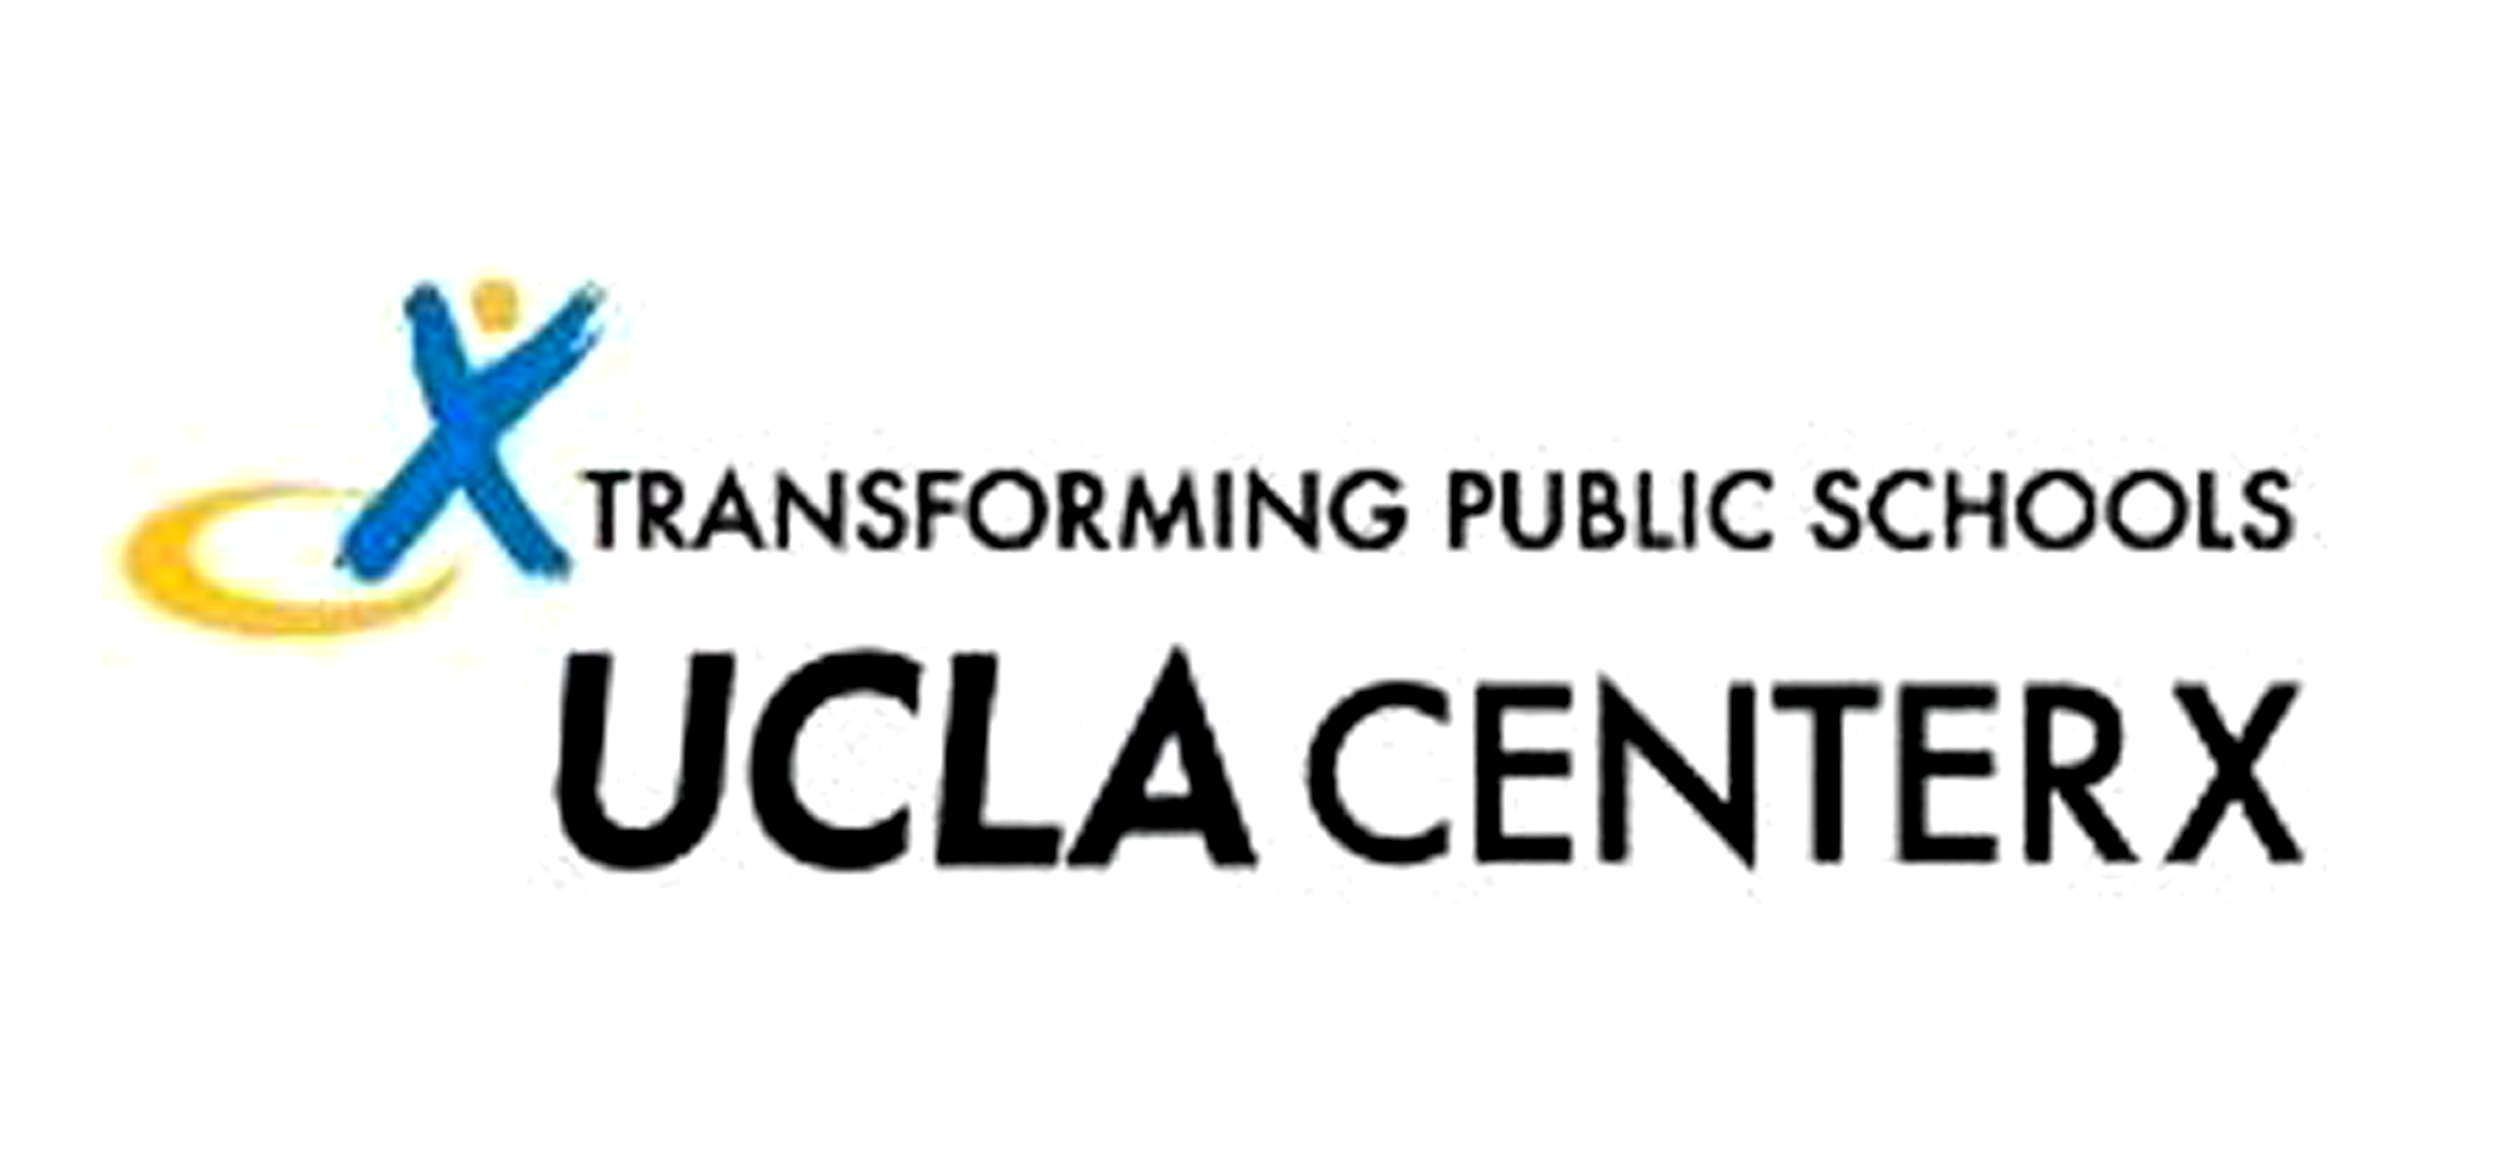 UCLA CENTERX.png